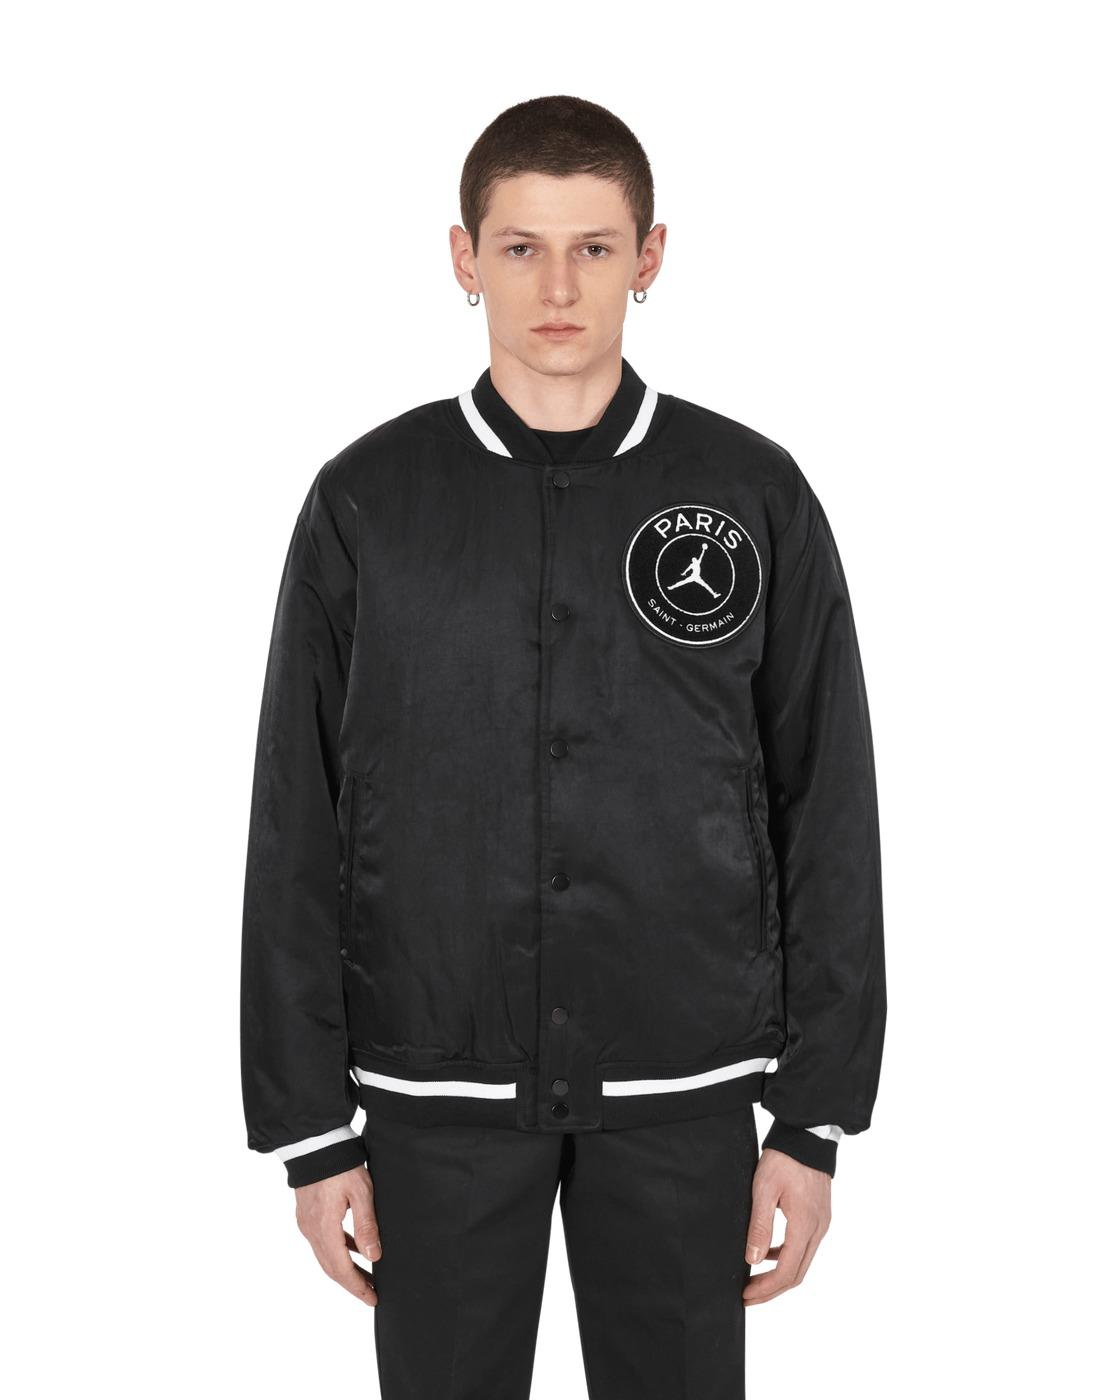 Nike Jordan Paris Saint Germain Varsity Jacket Black/Bordeaux